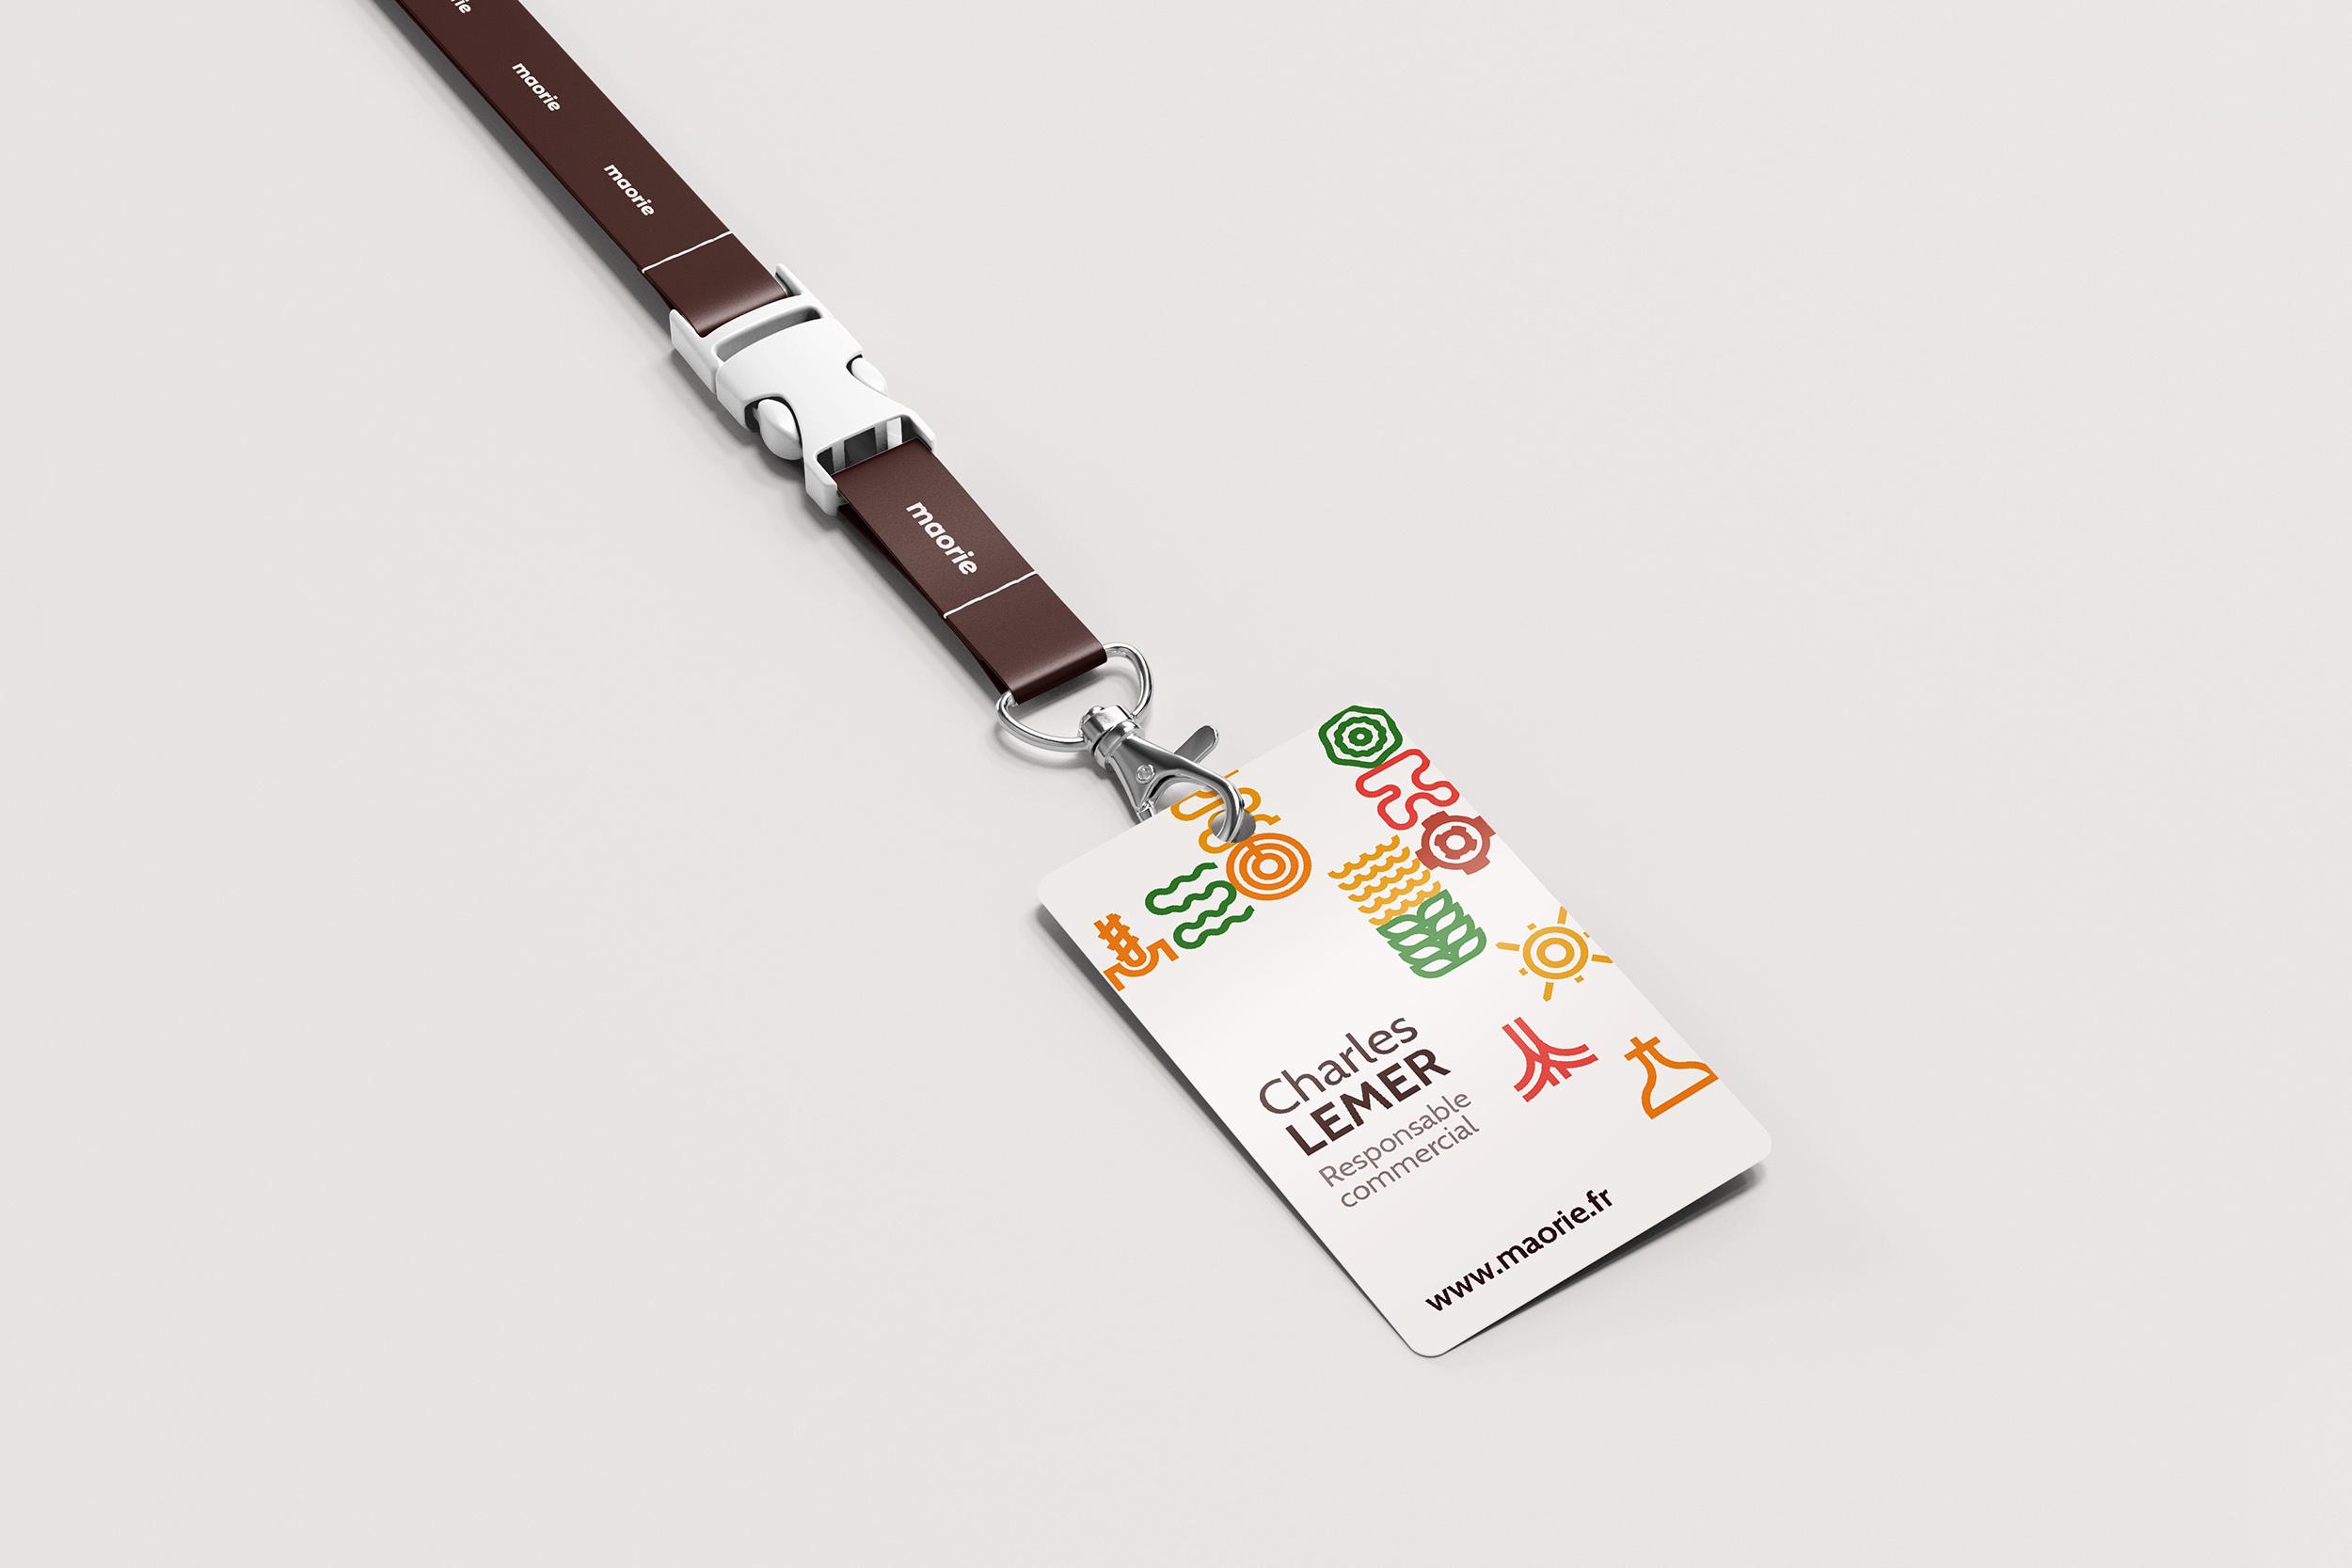 right badge, salon, événement, logo, symbole